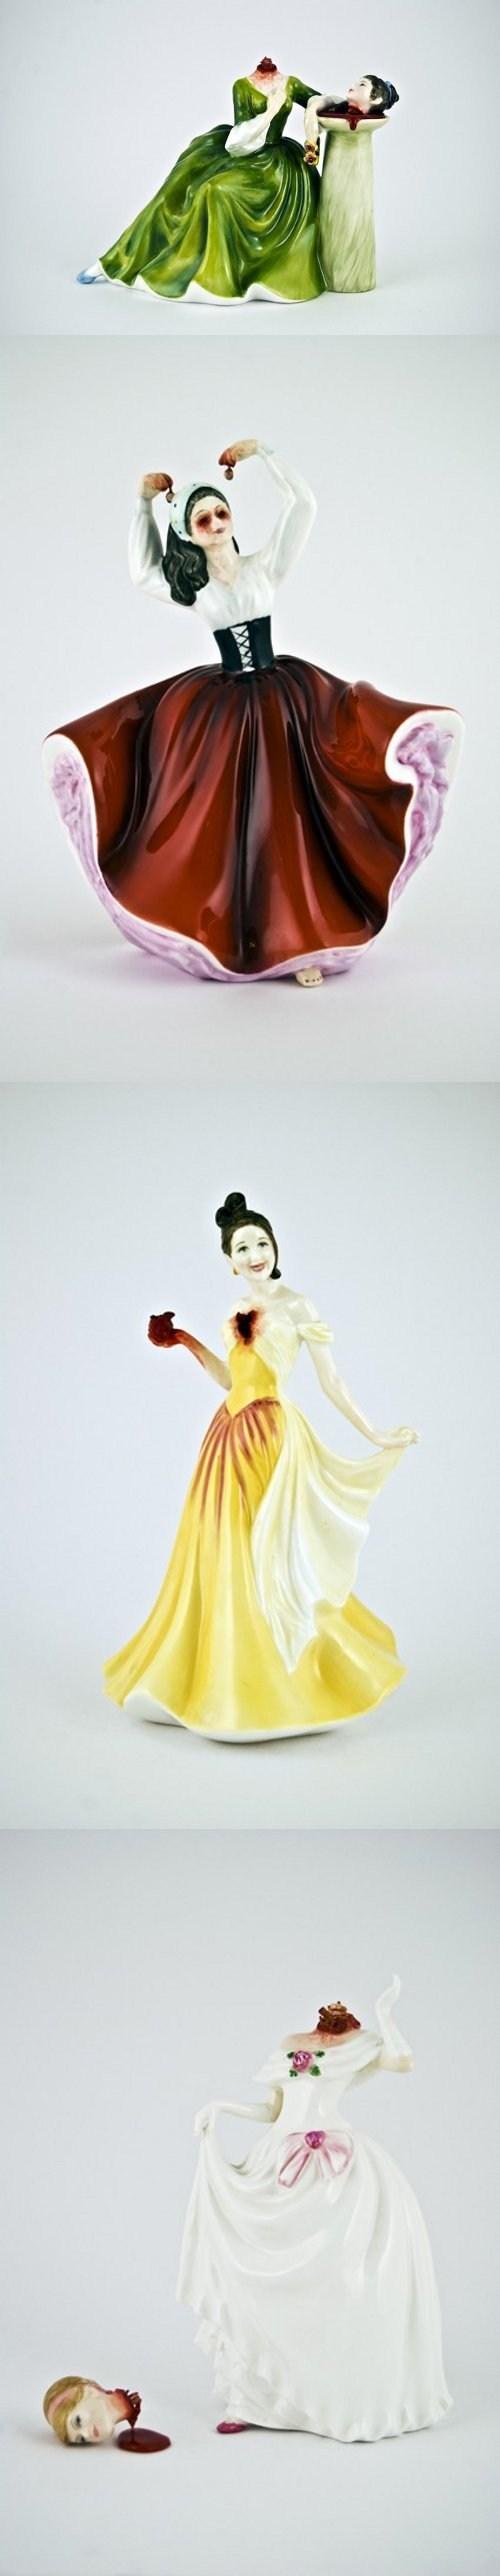 Blood creepy porcelain figurine headless - 7038894848